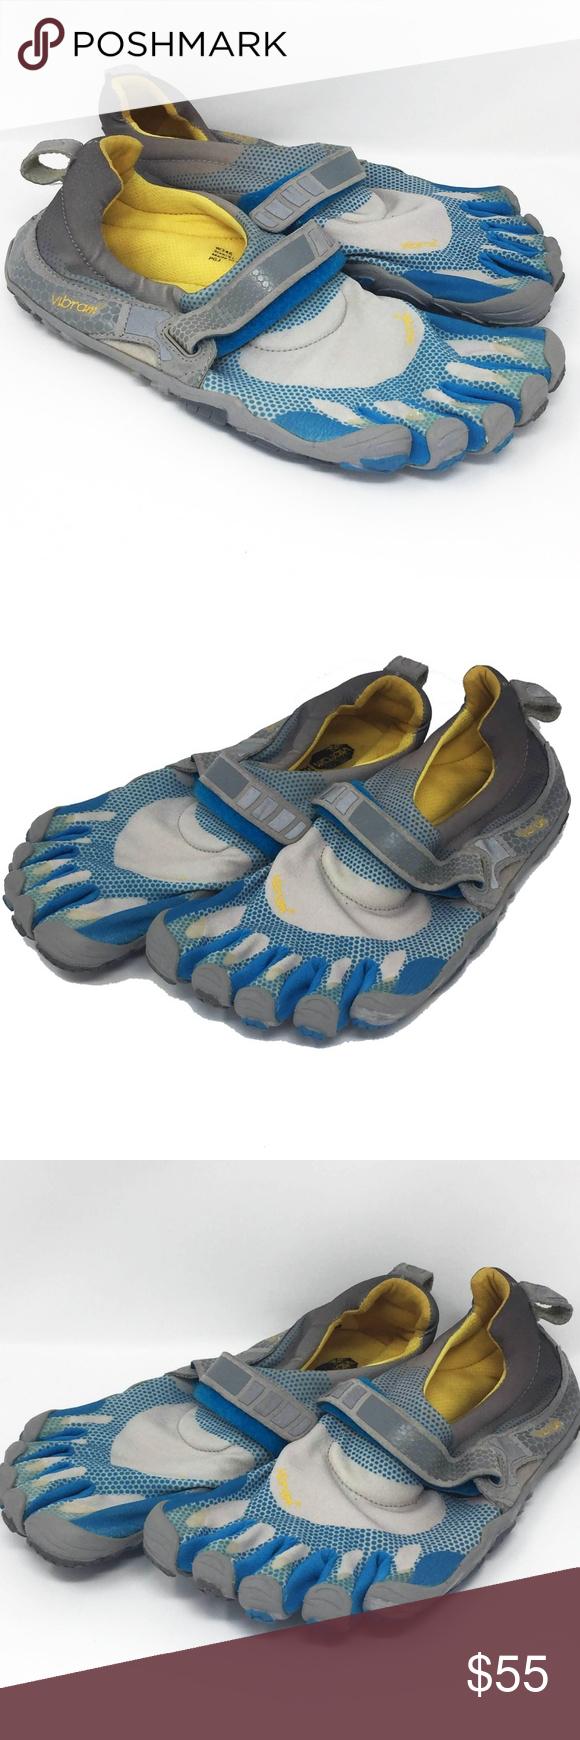 brand new 04aa6 e129d Vibram FiveFingers W346 Bikila Size Euro 41 Vibram W346 Bikila Sky Blue    Dark Grey   Grey Sky Blue Womens Barefoot Minimalist Toe Shoes EU 41 US 9  1 2 All ...